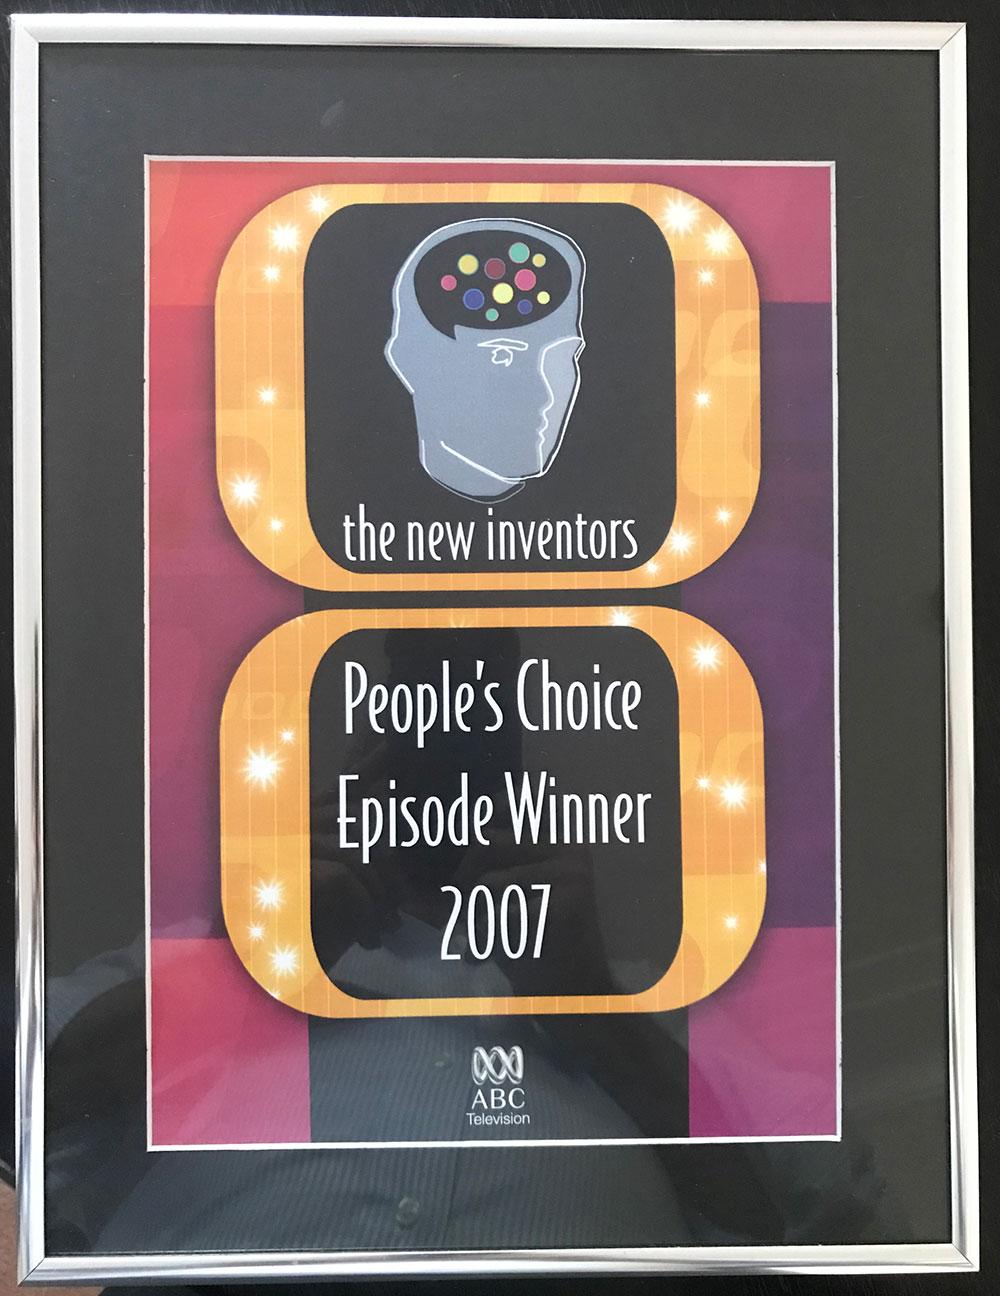 Transking New Inventors Award